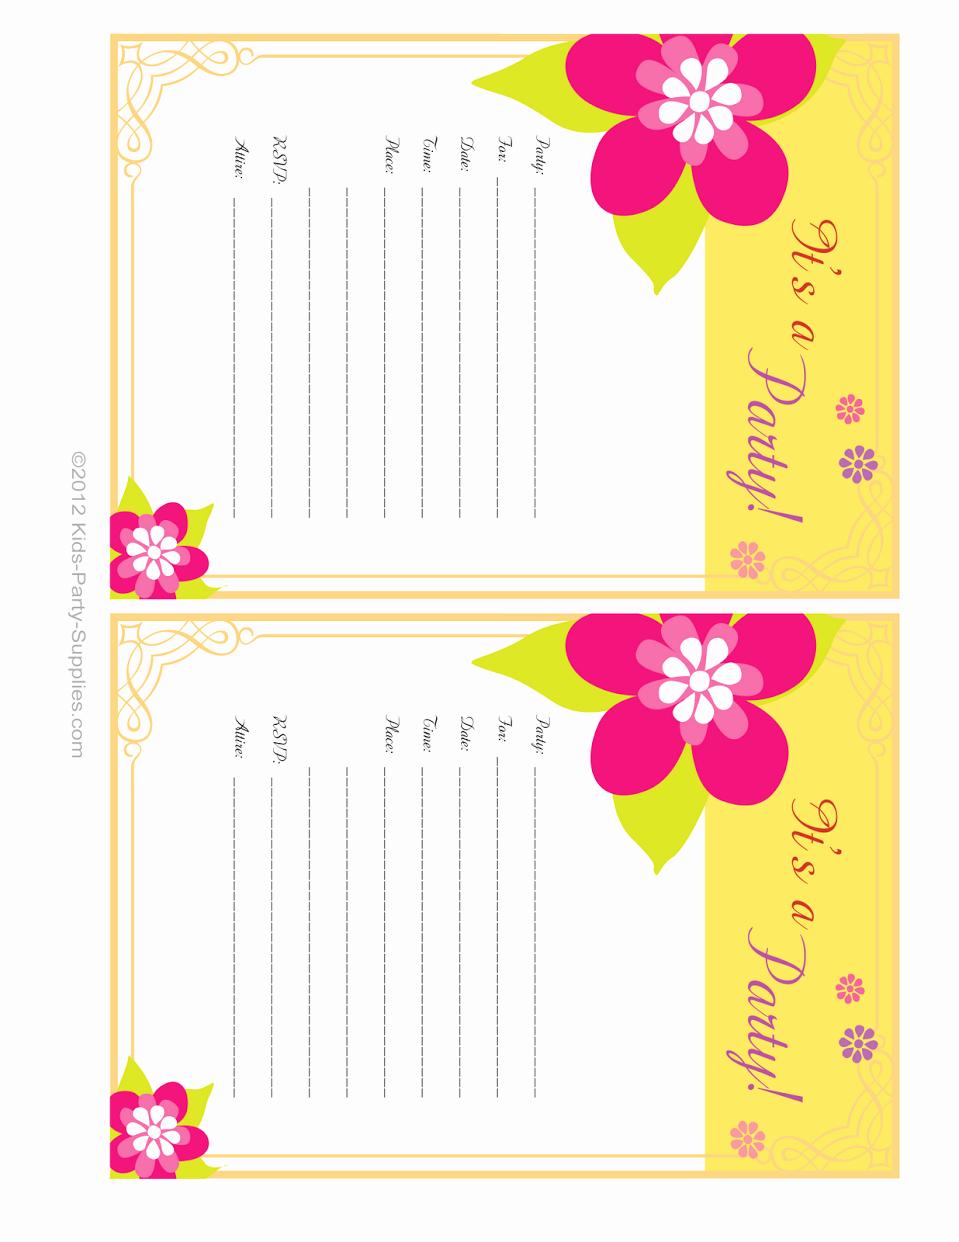 Hawaiian Party Invitation Template Free Luxury Hawaiian Party Invitations Free Printable